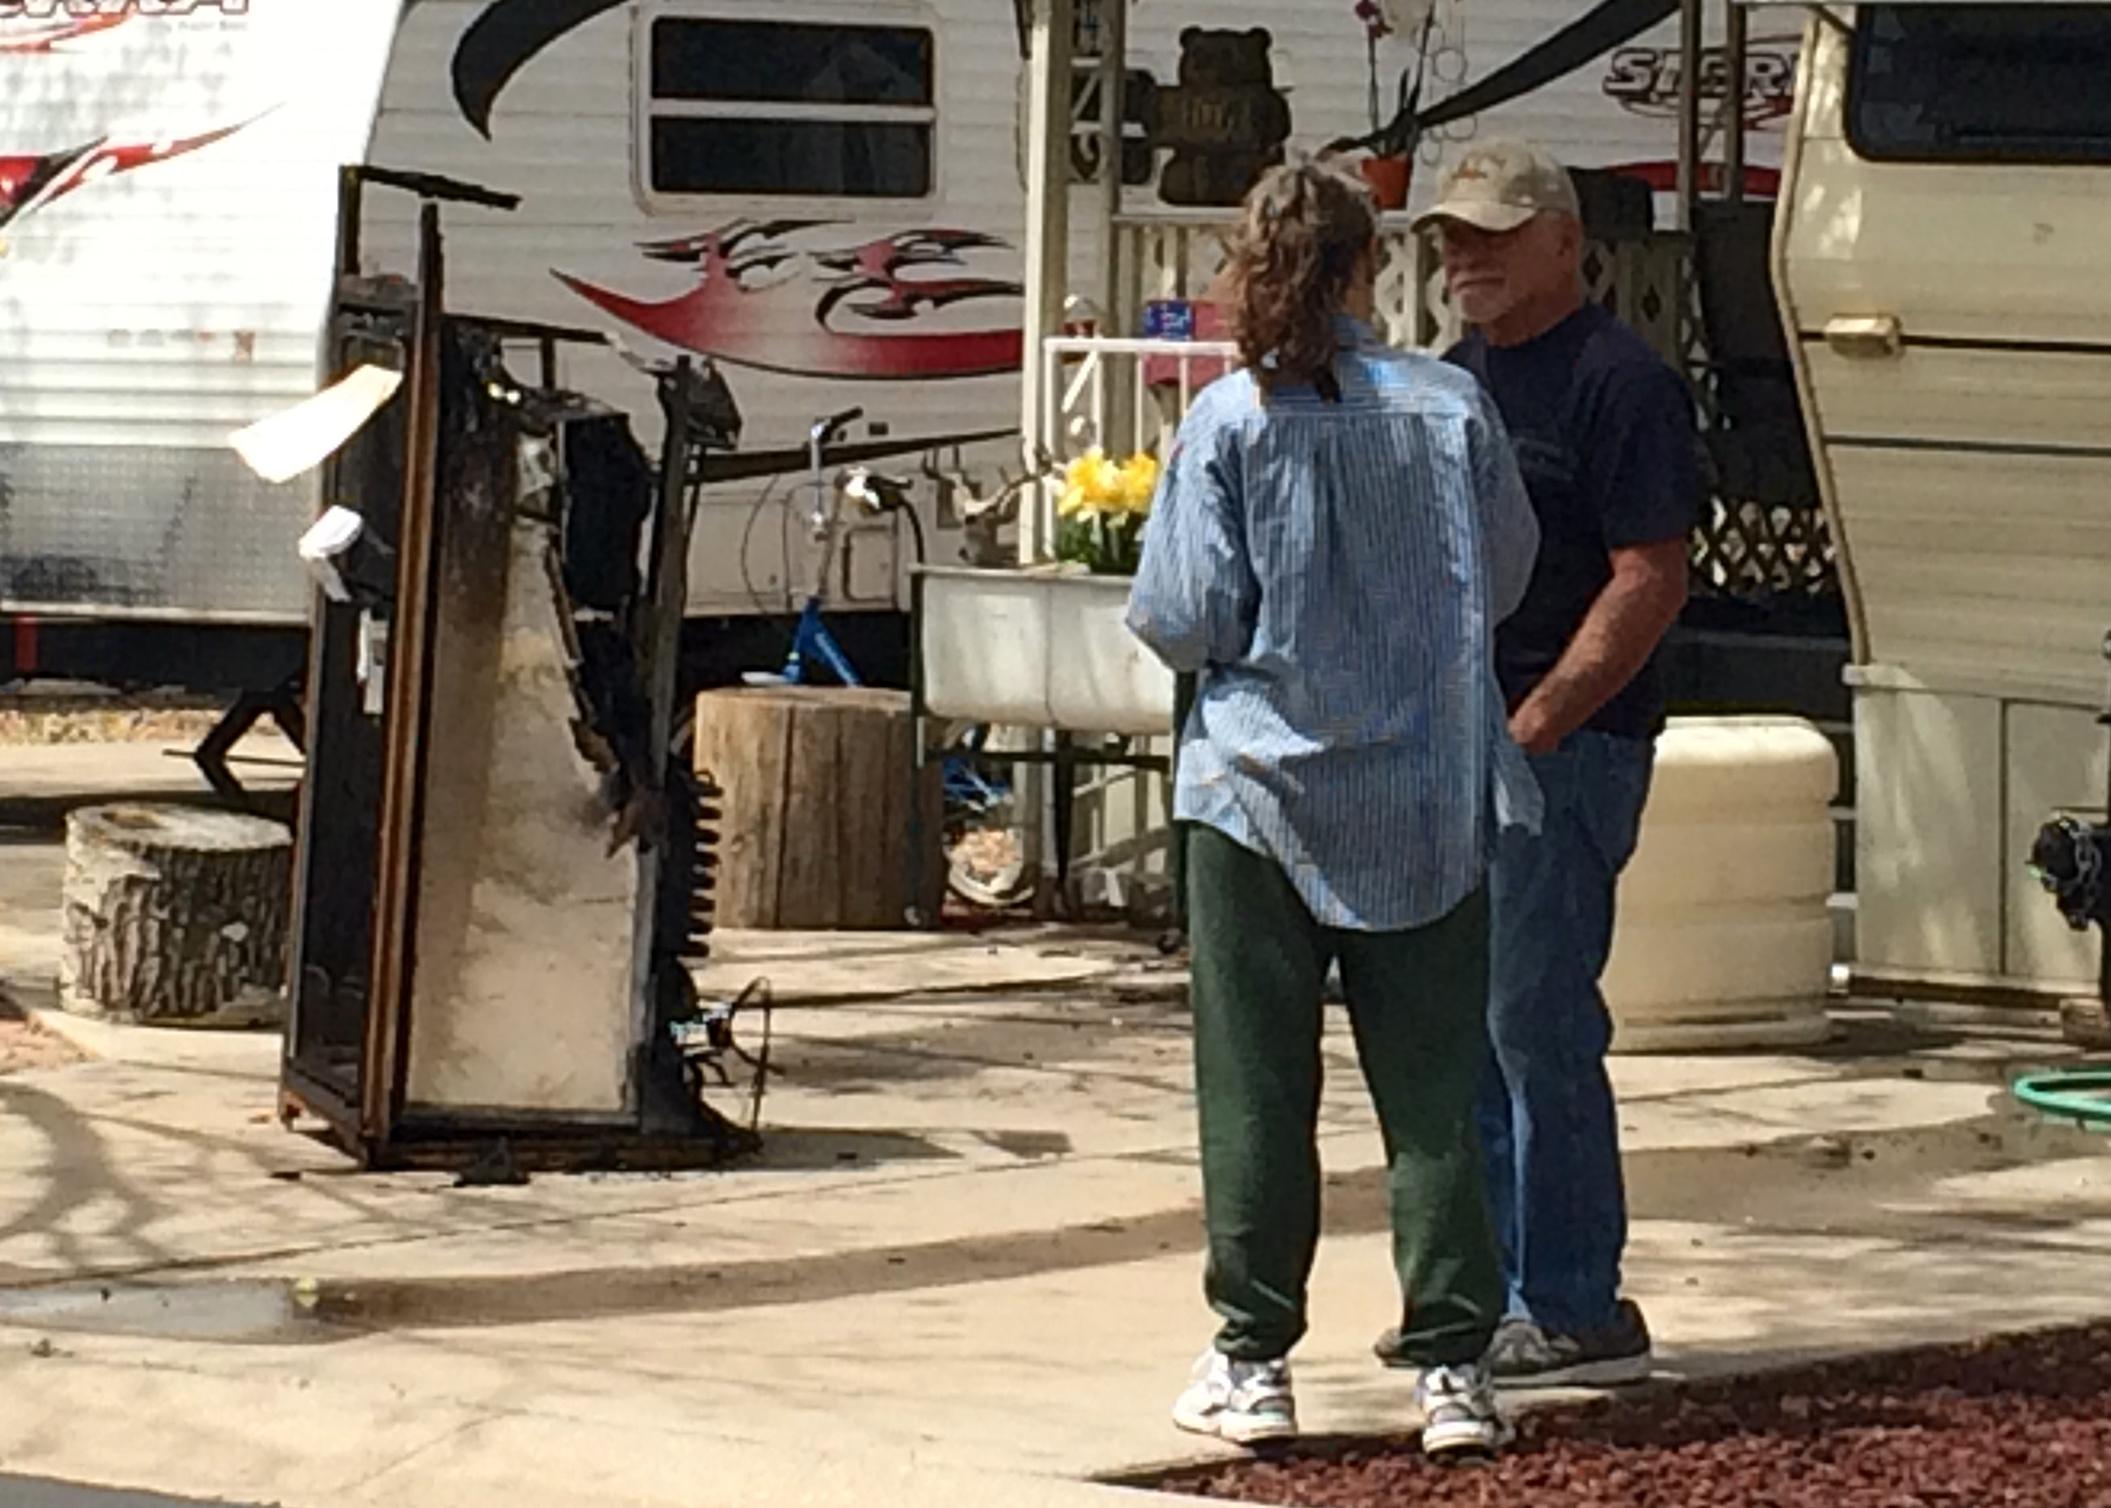 Mobile Home Fire Foothills RV Subdivision Parowan Utah May 12 2015